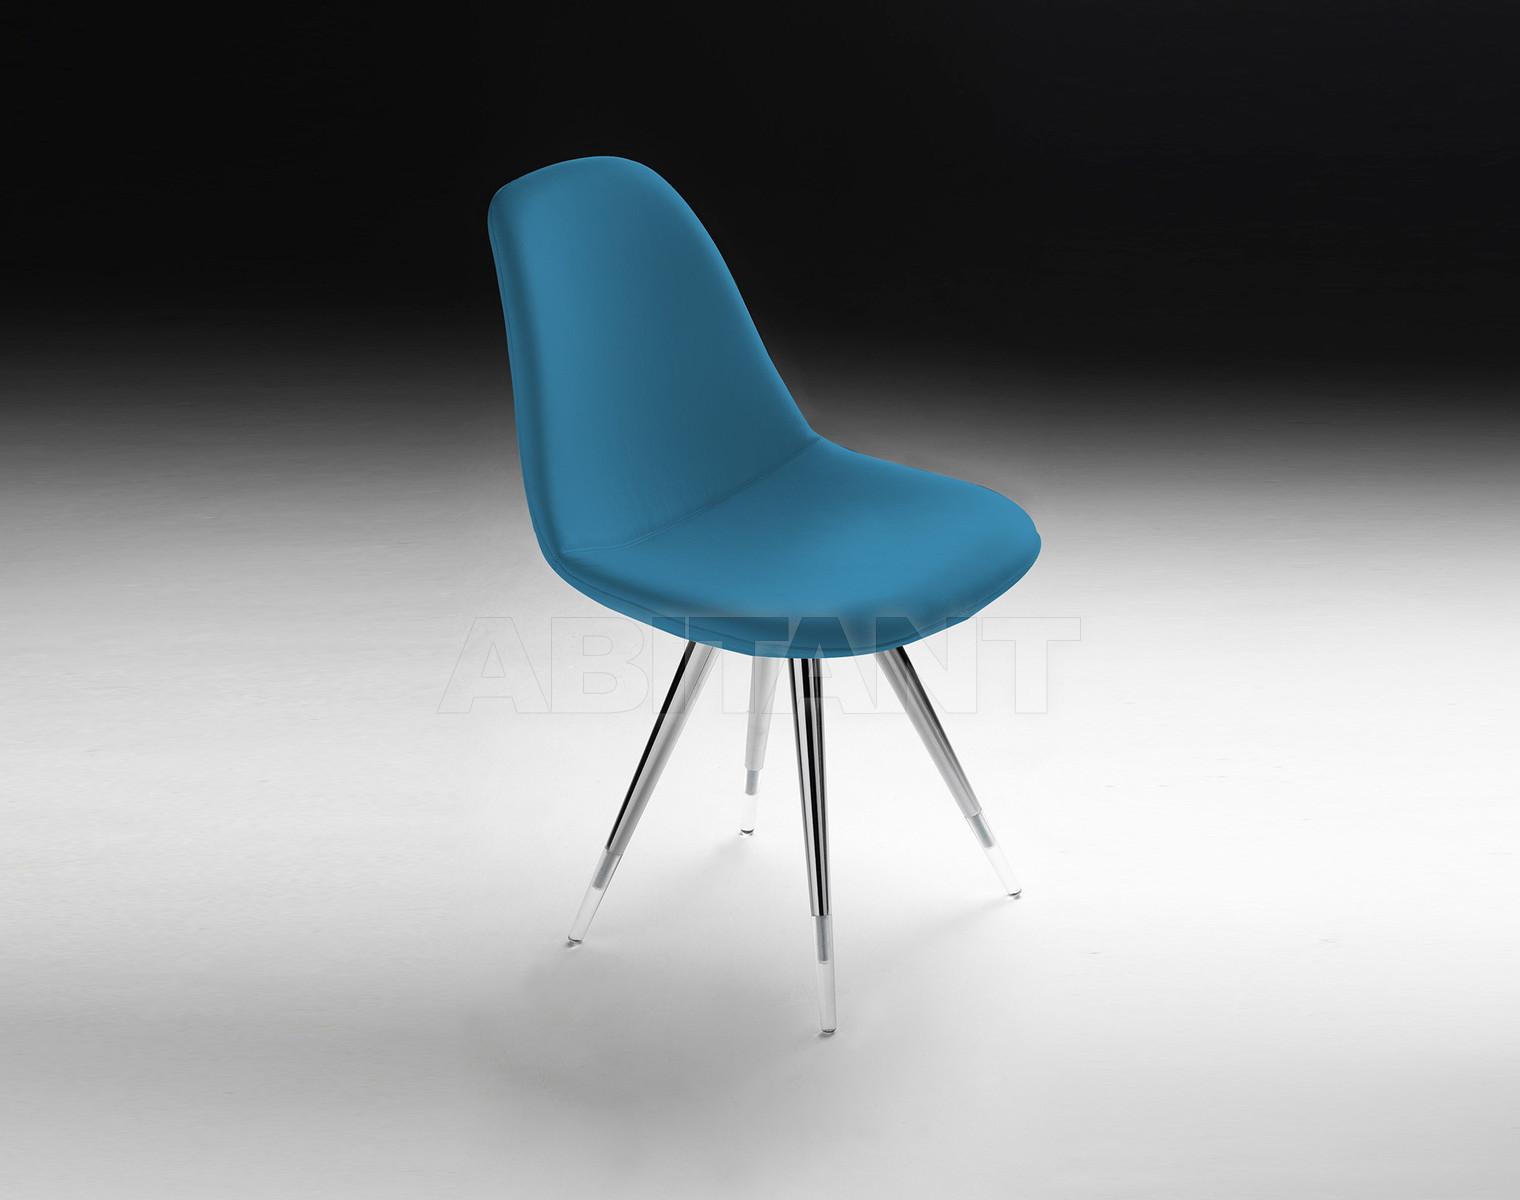 Купить Стул Kubikoff Gino Lemson & Ruud Bos Angel'POP'Chair'  14